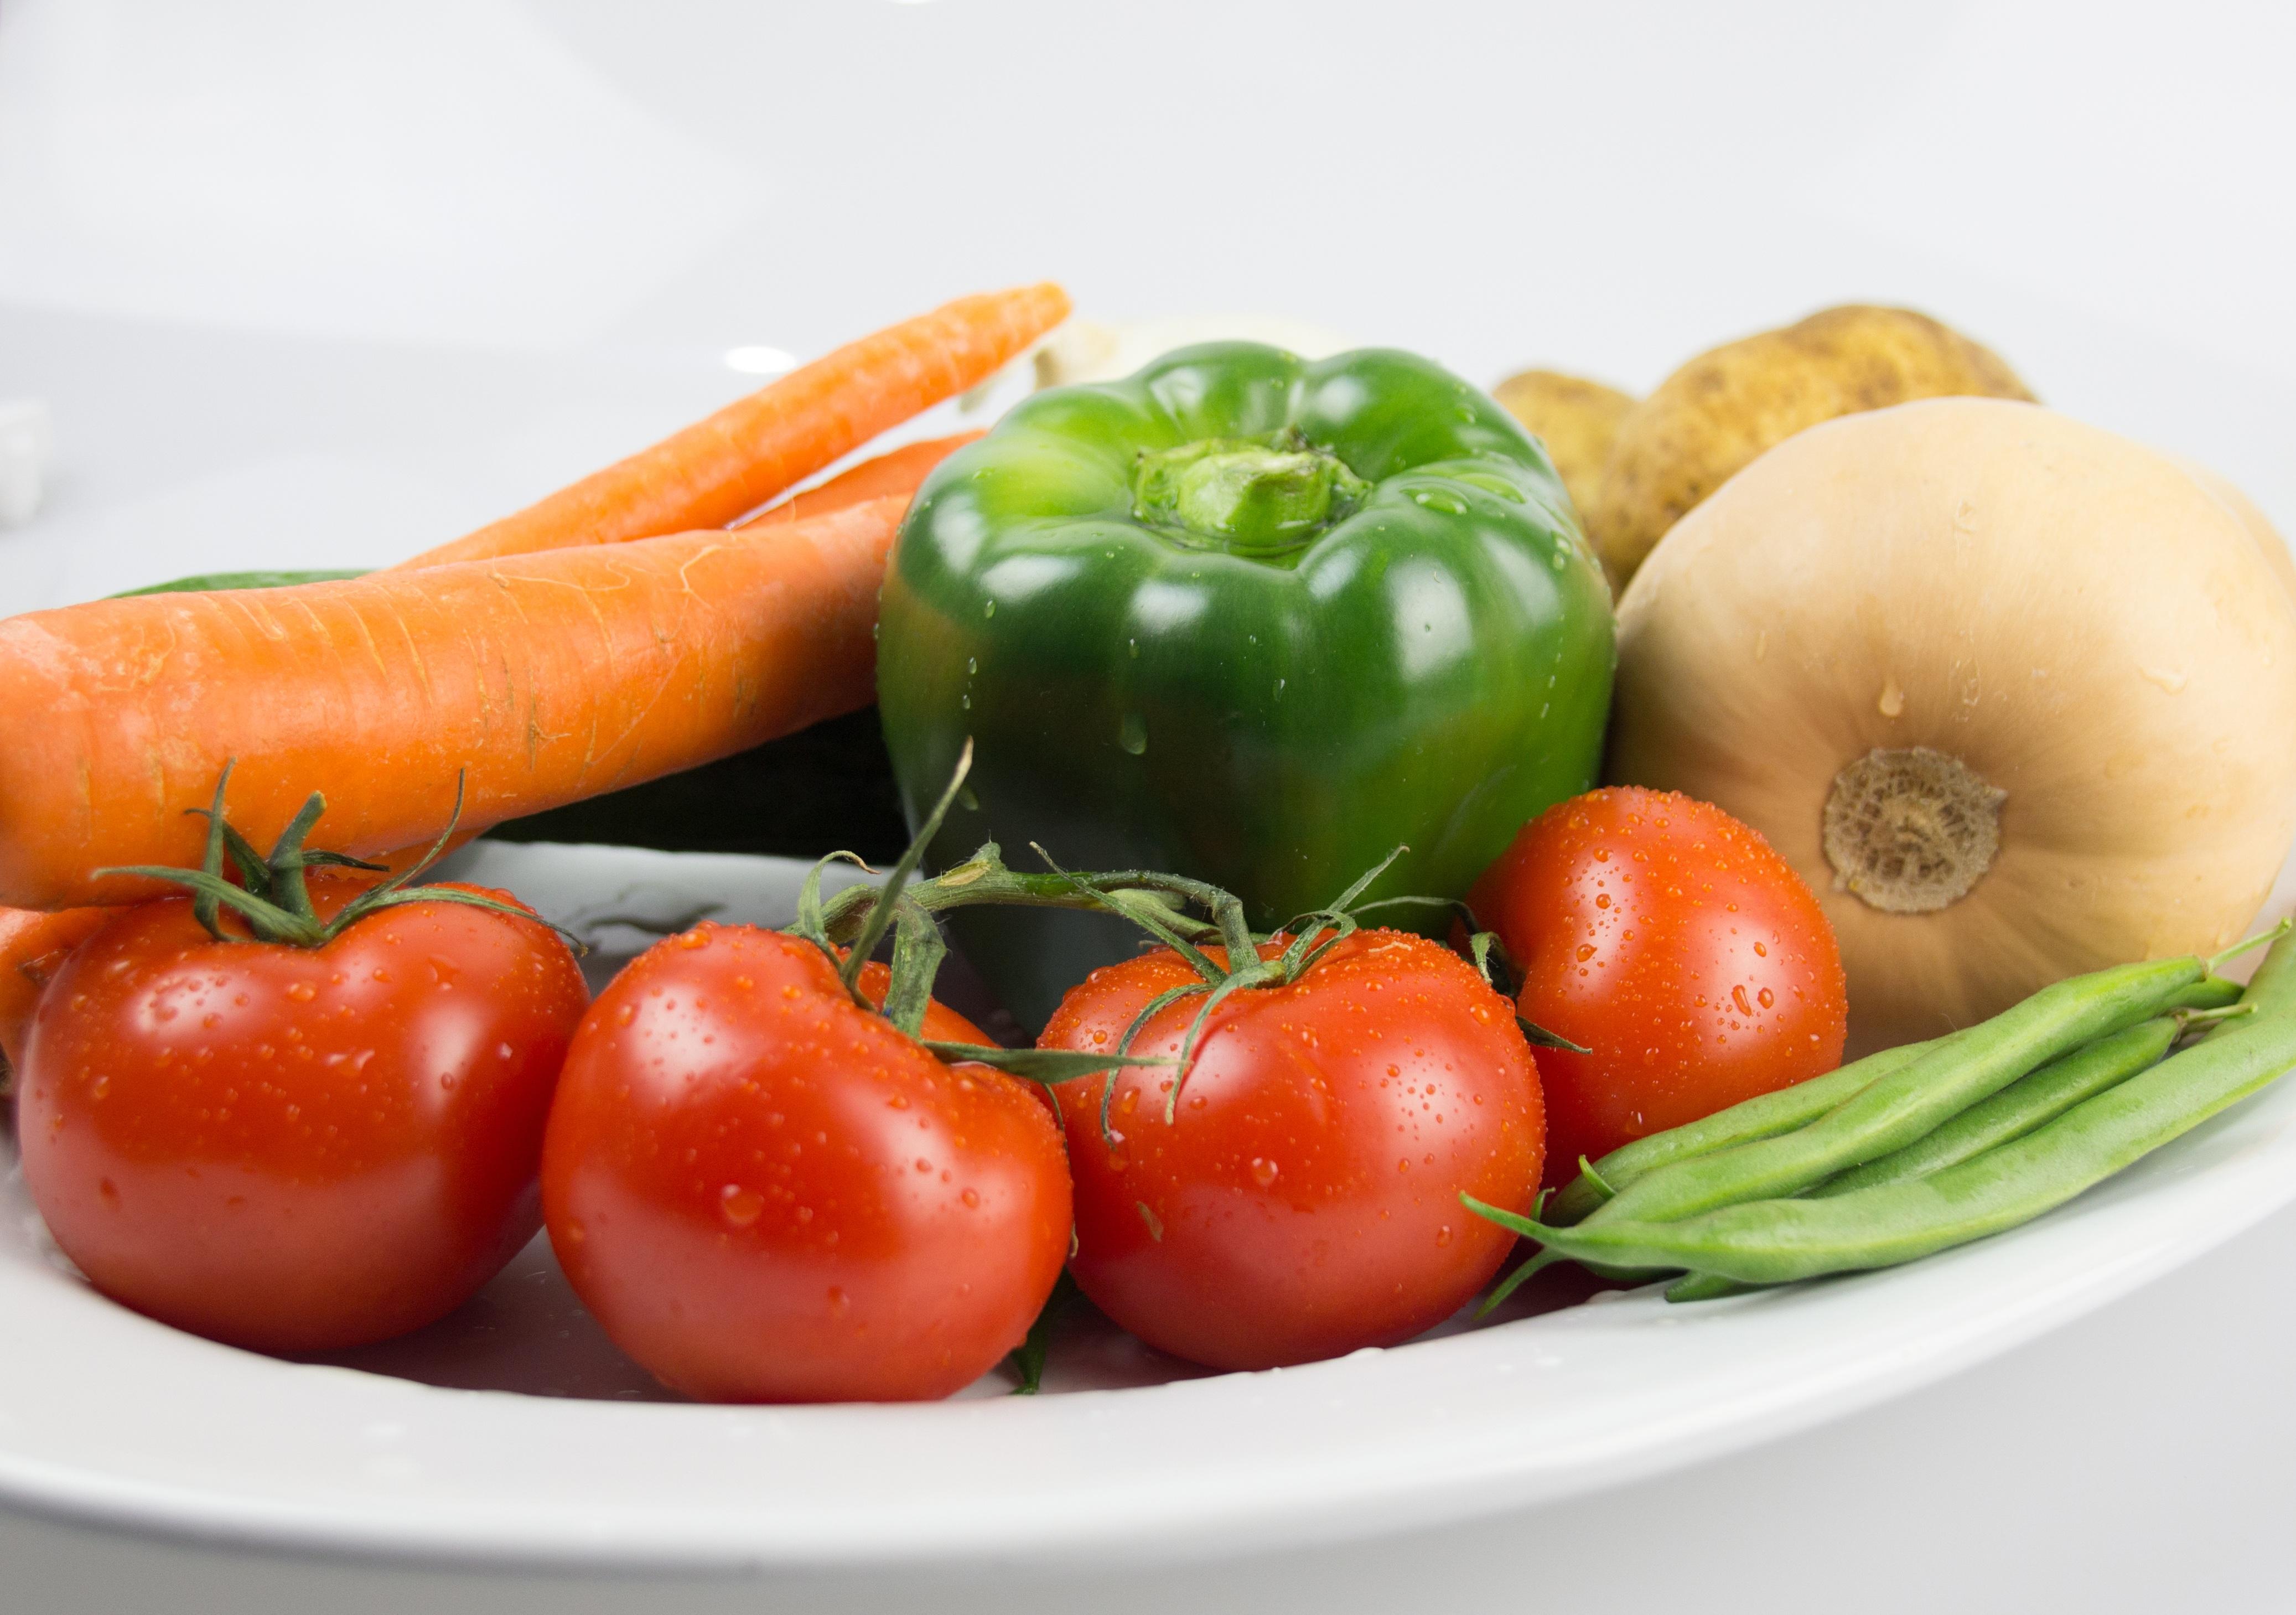 Fotos gratis : restaurante, plato, comida, Produce, vegetal, cocina ...